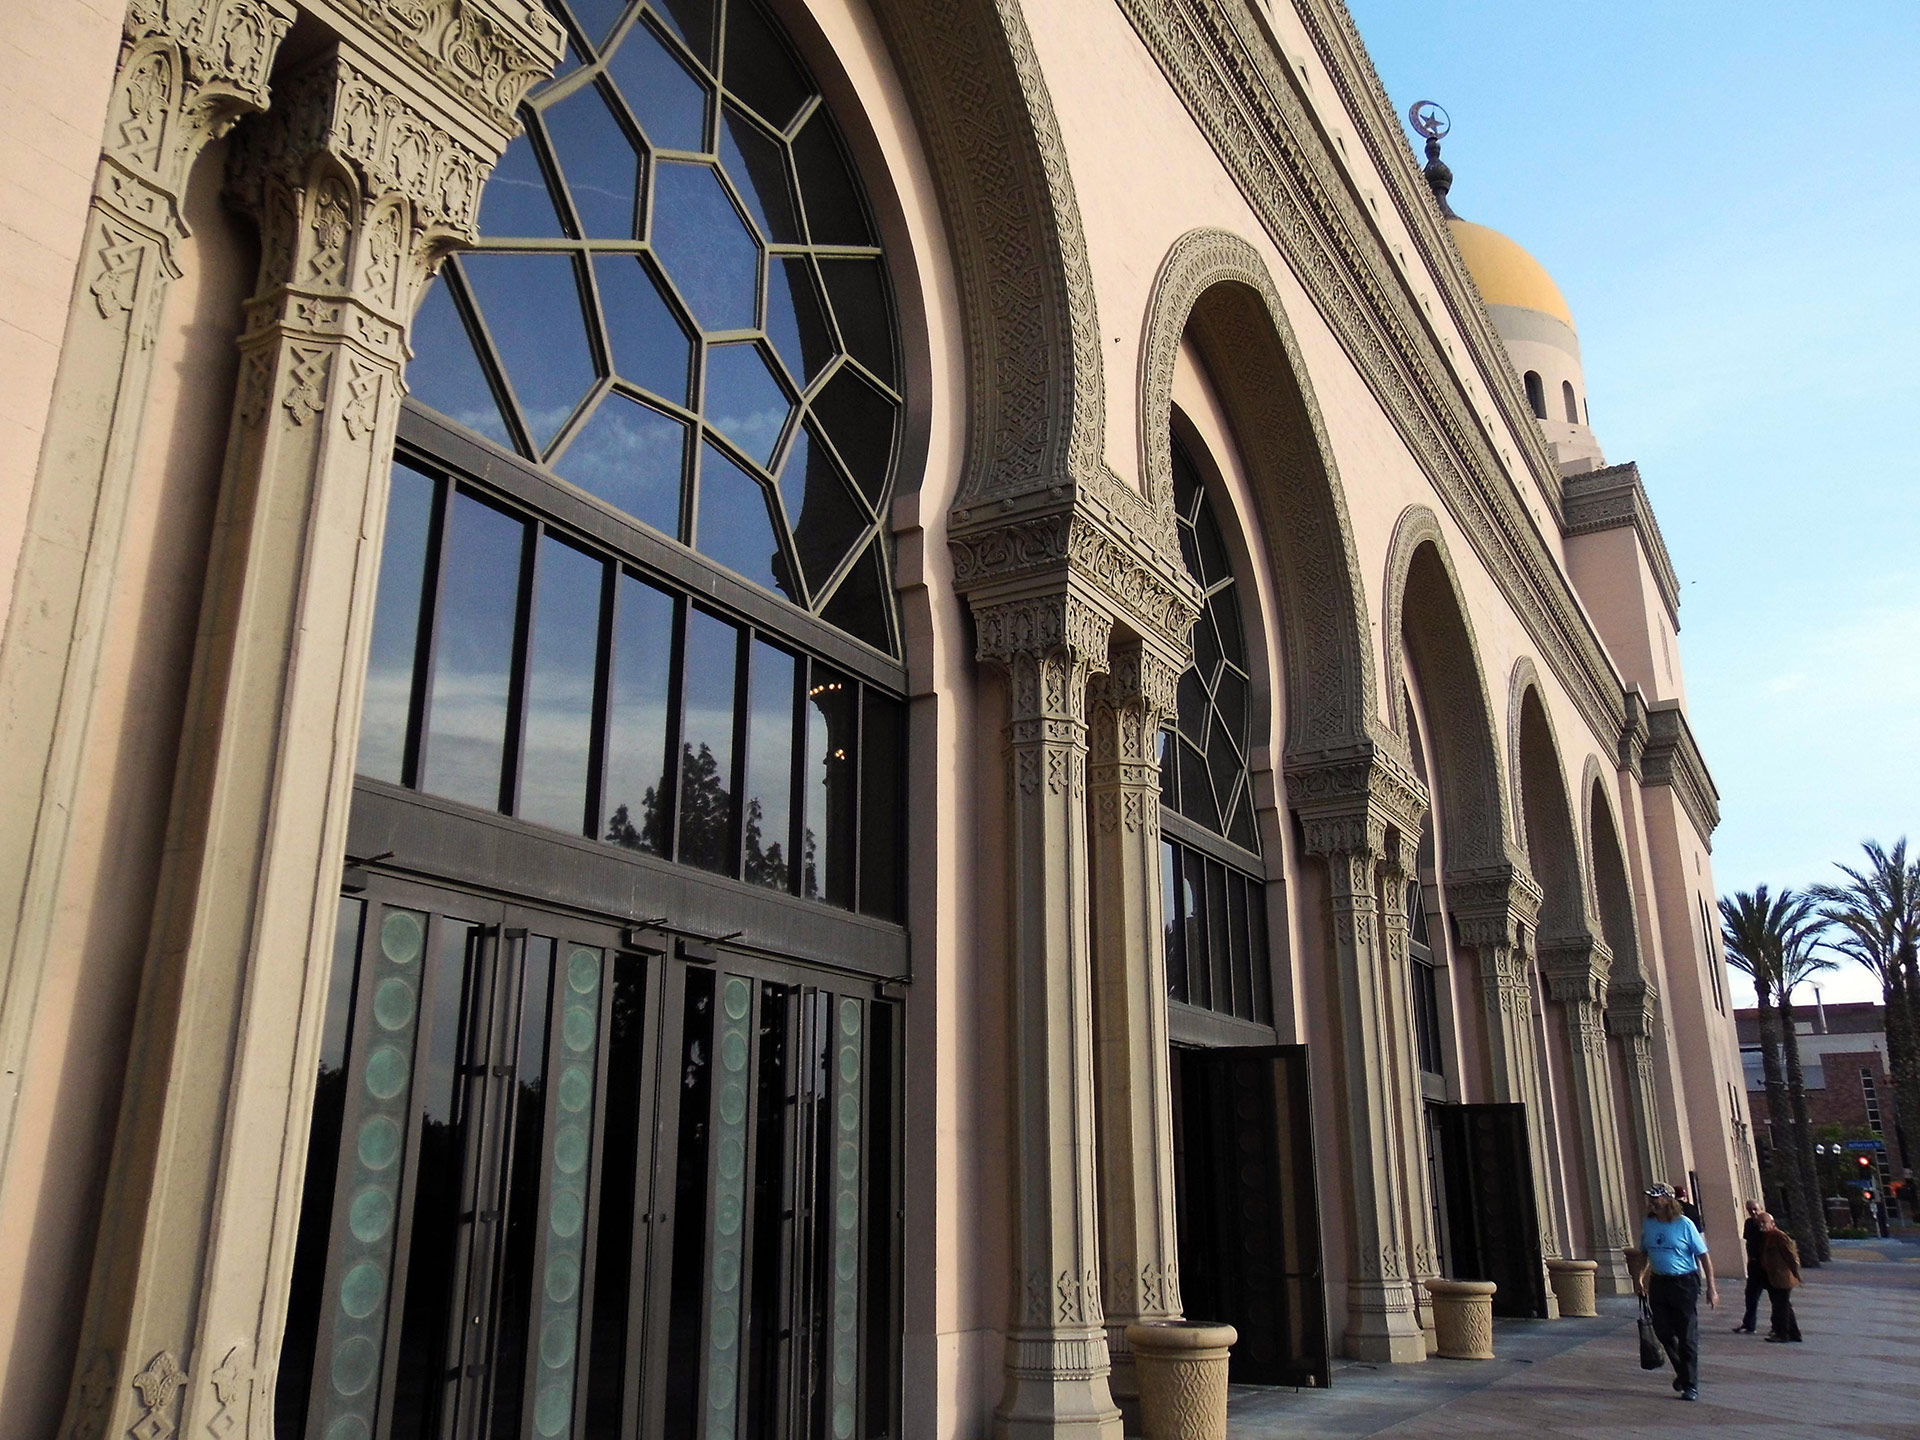 The Shrine Auditorium and Expo Hall's design evokes Arabic influences and Islamic art. | Sandi Hemmerlein